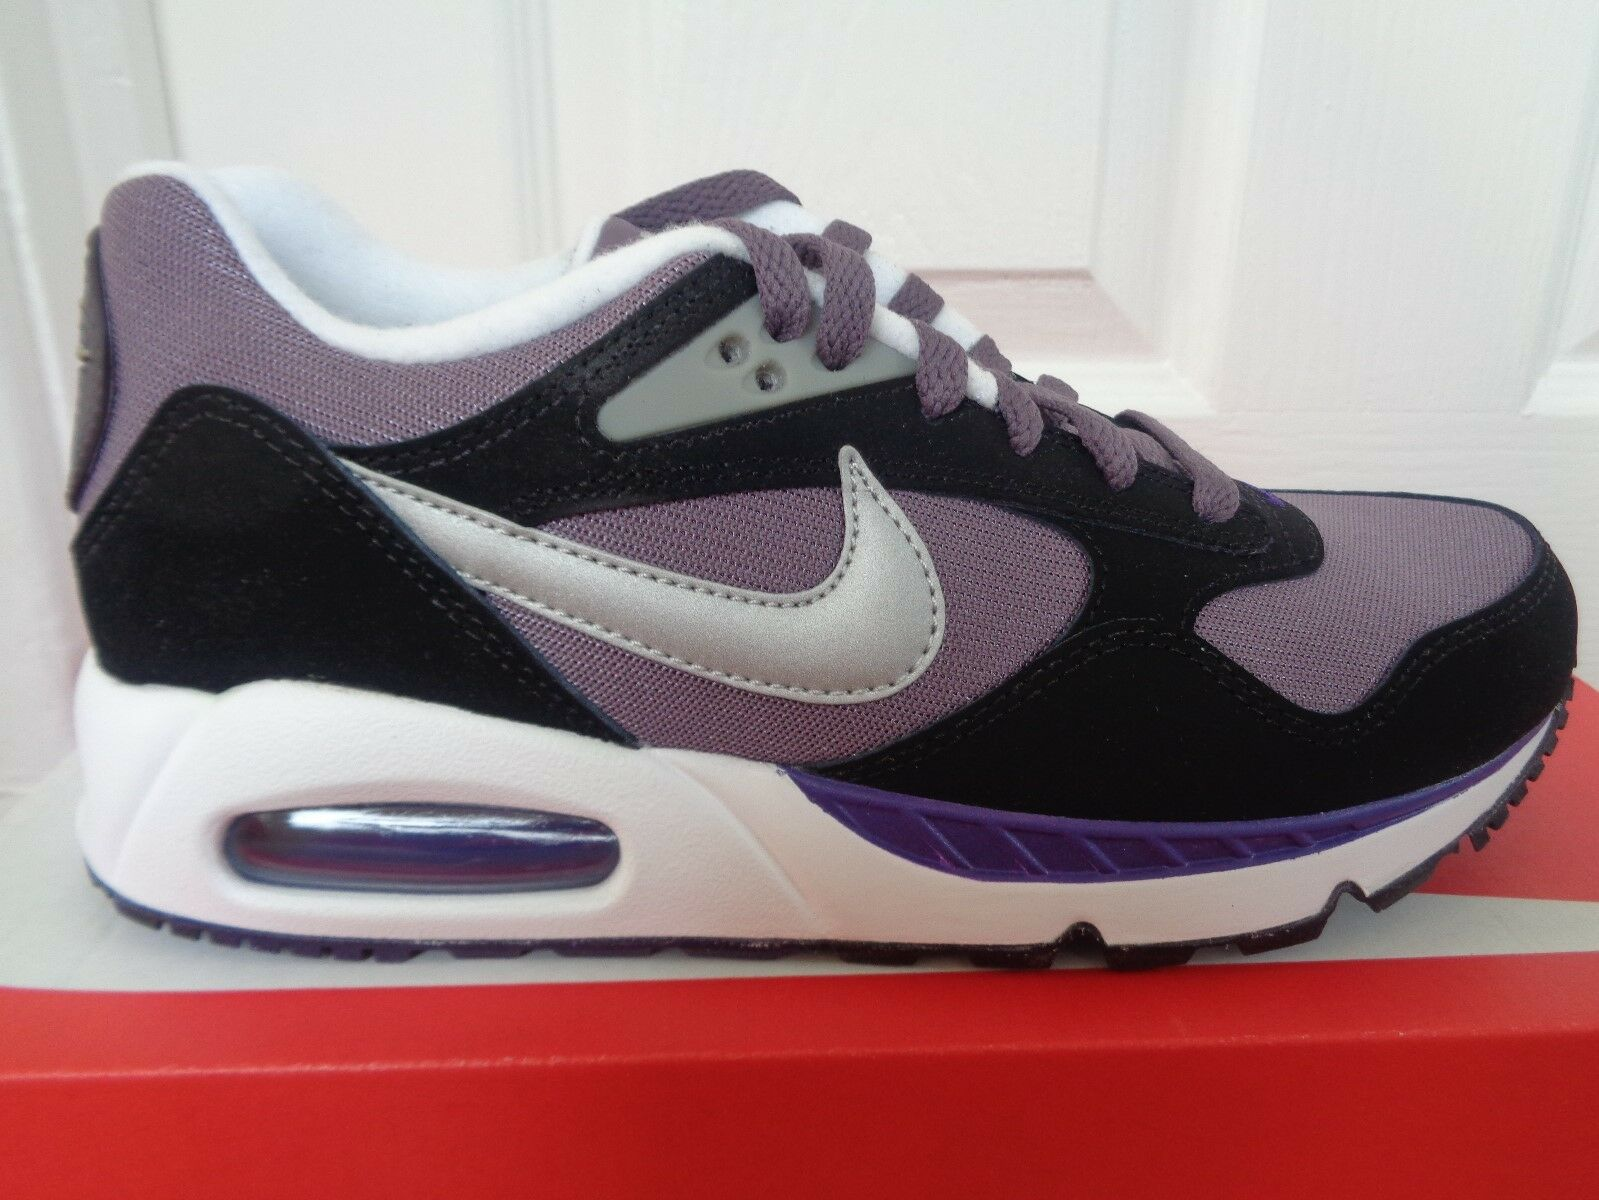 Nike Air max Correlate femmes  trainers 4 Baskets 511417 500 uk 4 trainers eu 37.5 us 6.5 NEW 4464b4